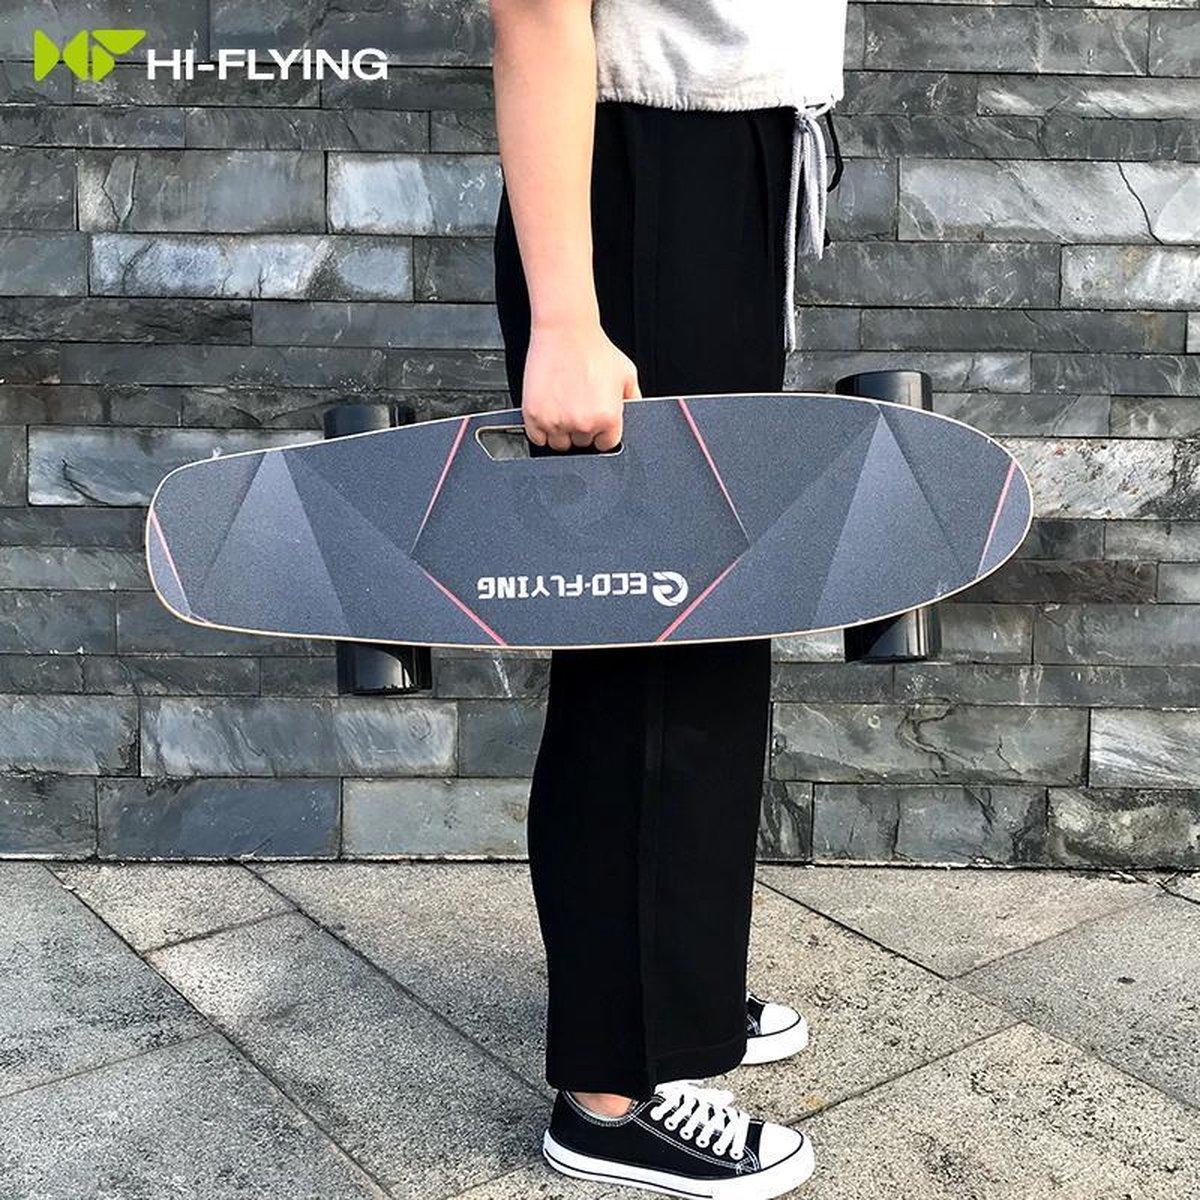 Hi-Flying 2S-01 Electrische Skateboard | 350w x 2 | 15km actiradius | 20km/u |